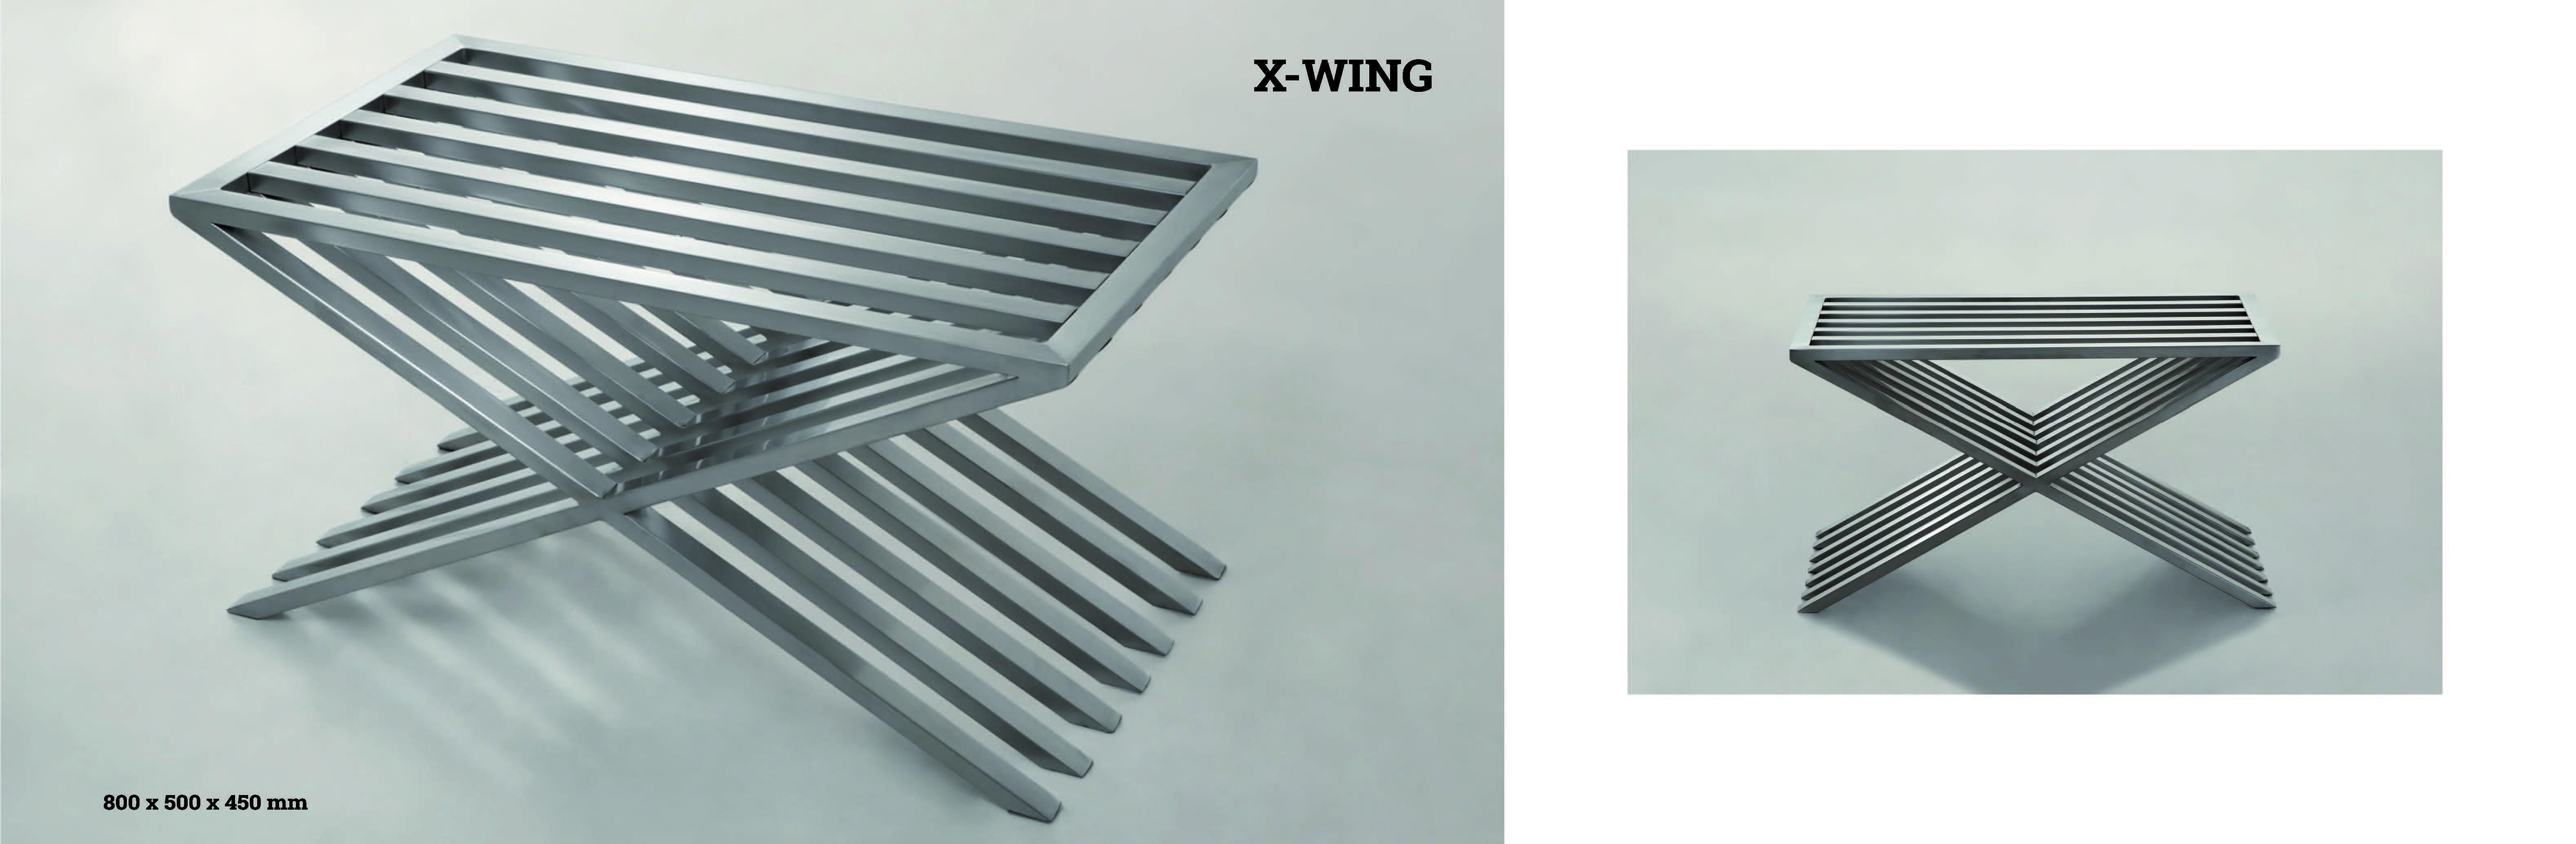 Banco X-Wing